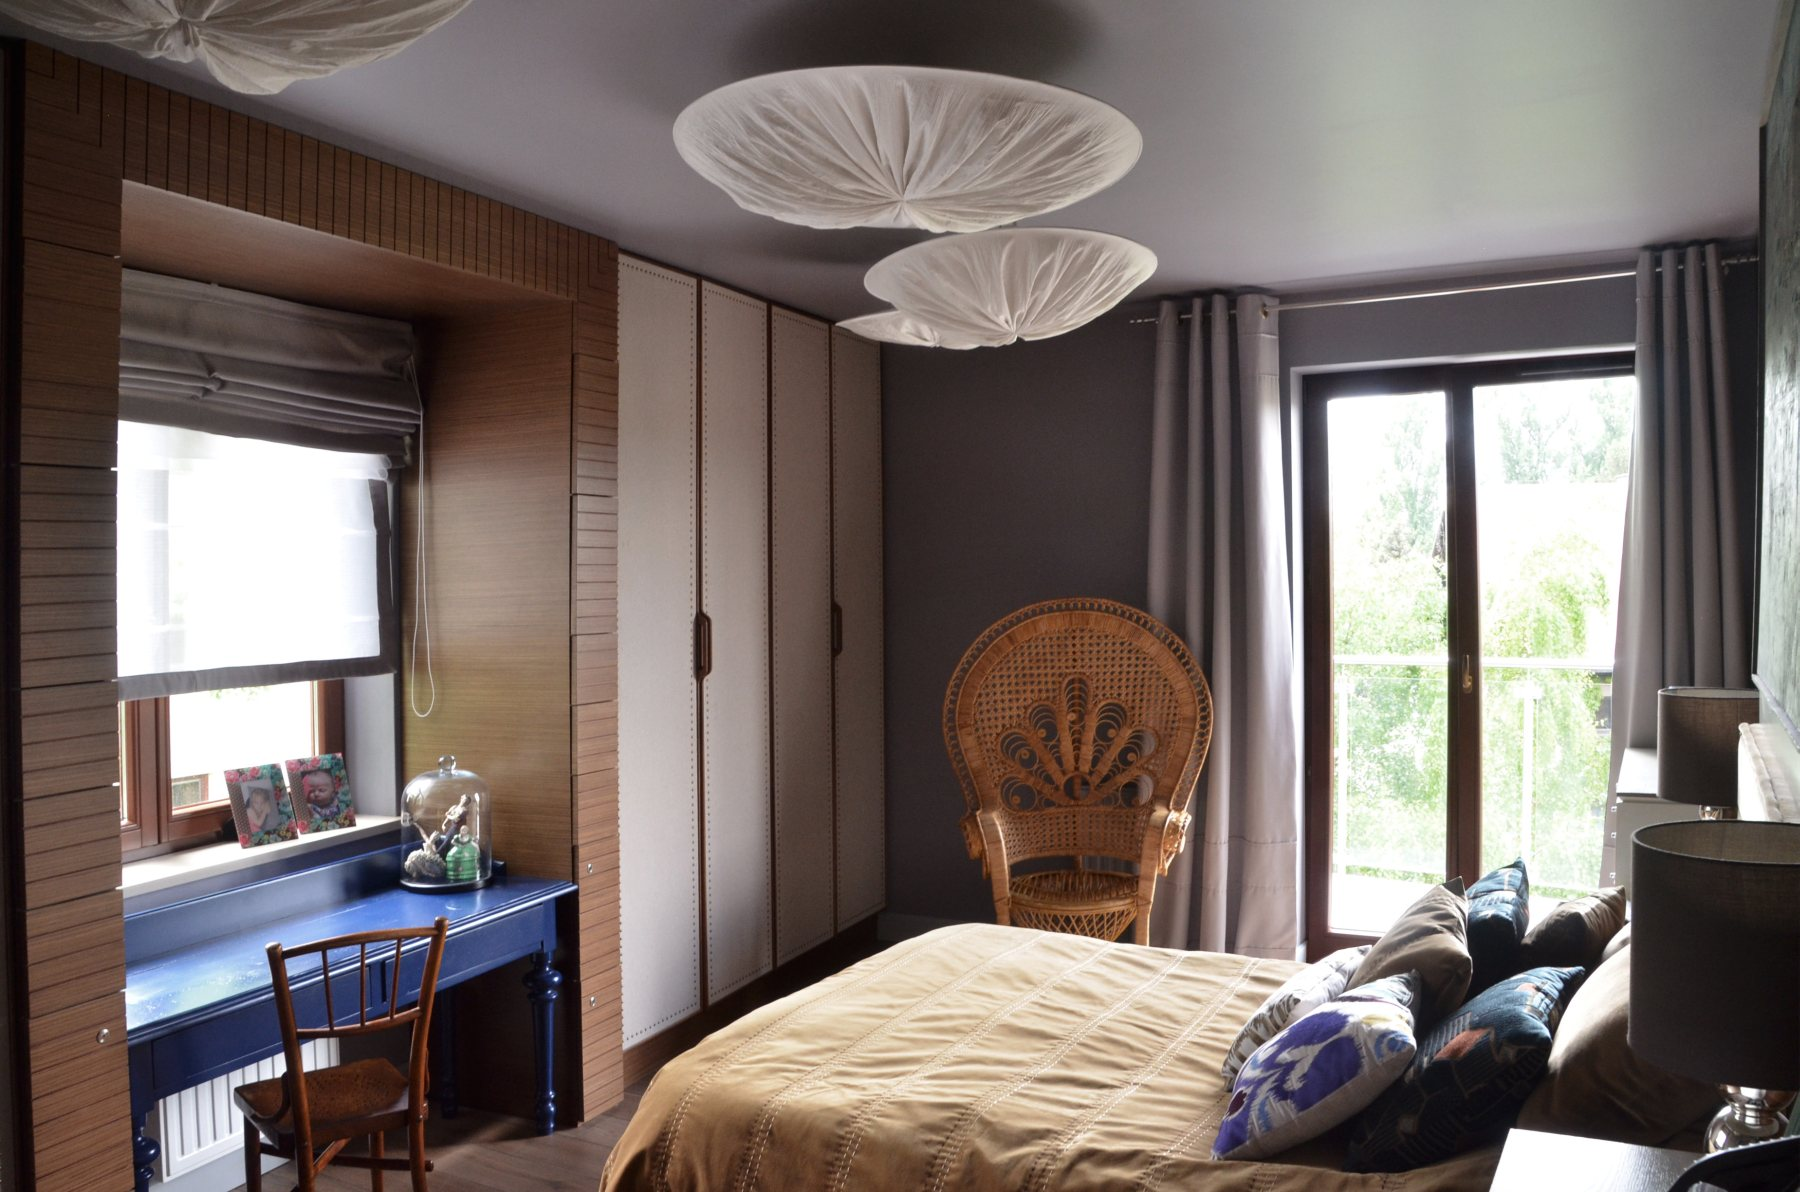 Sypialnia podroznika w kolorach ziemii peakock safari .jpg